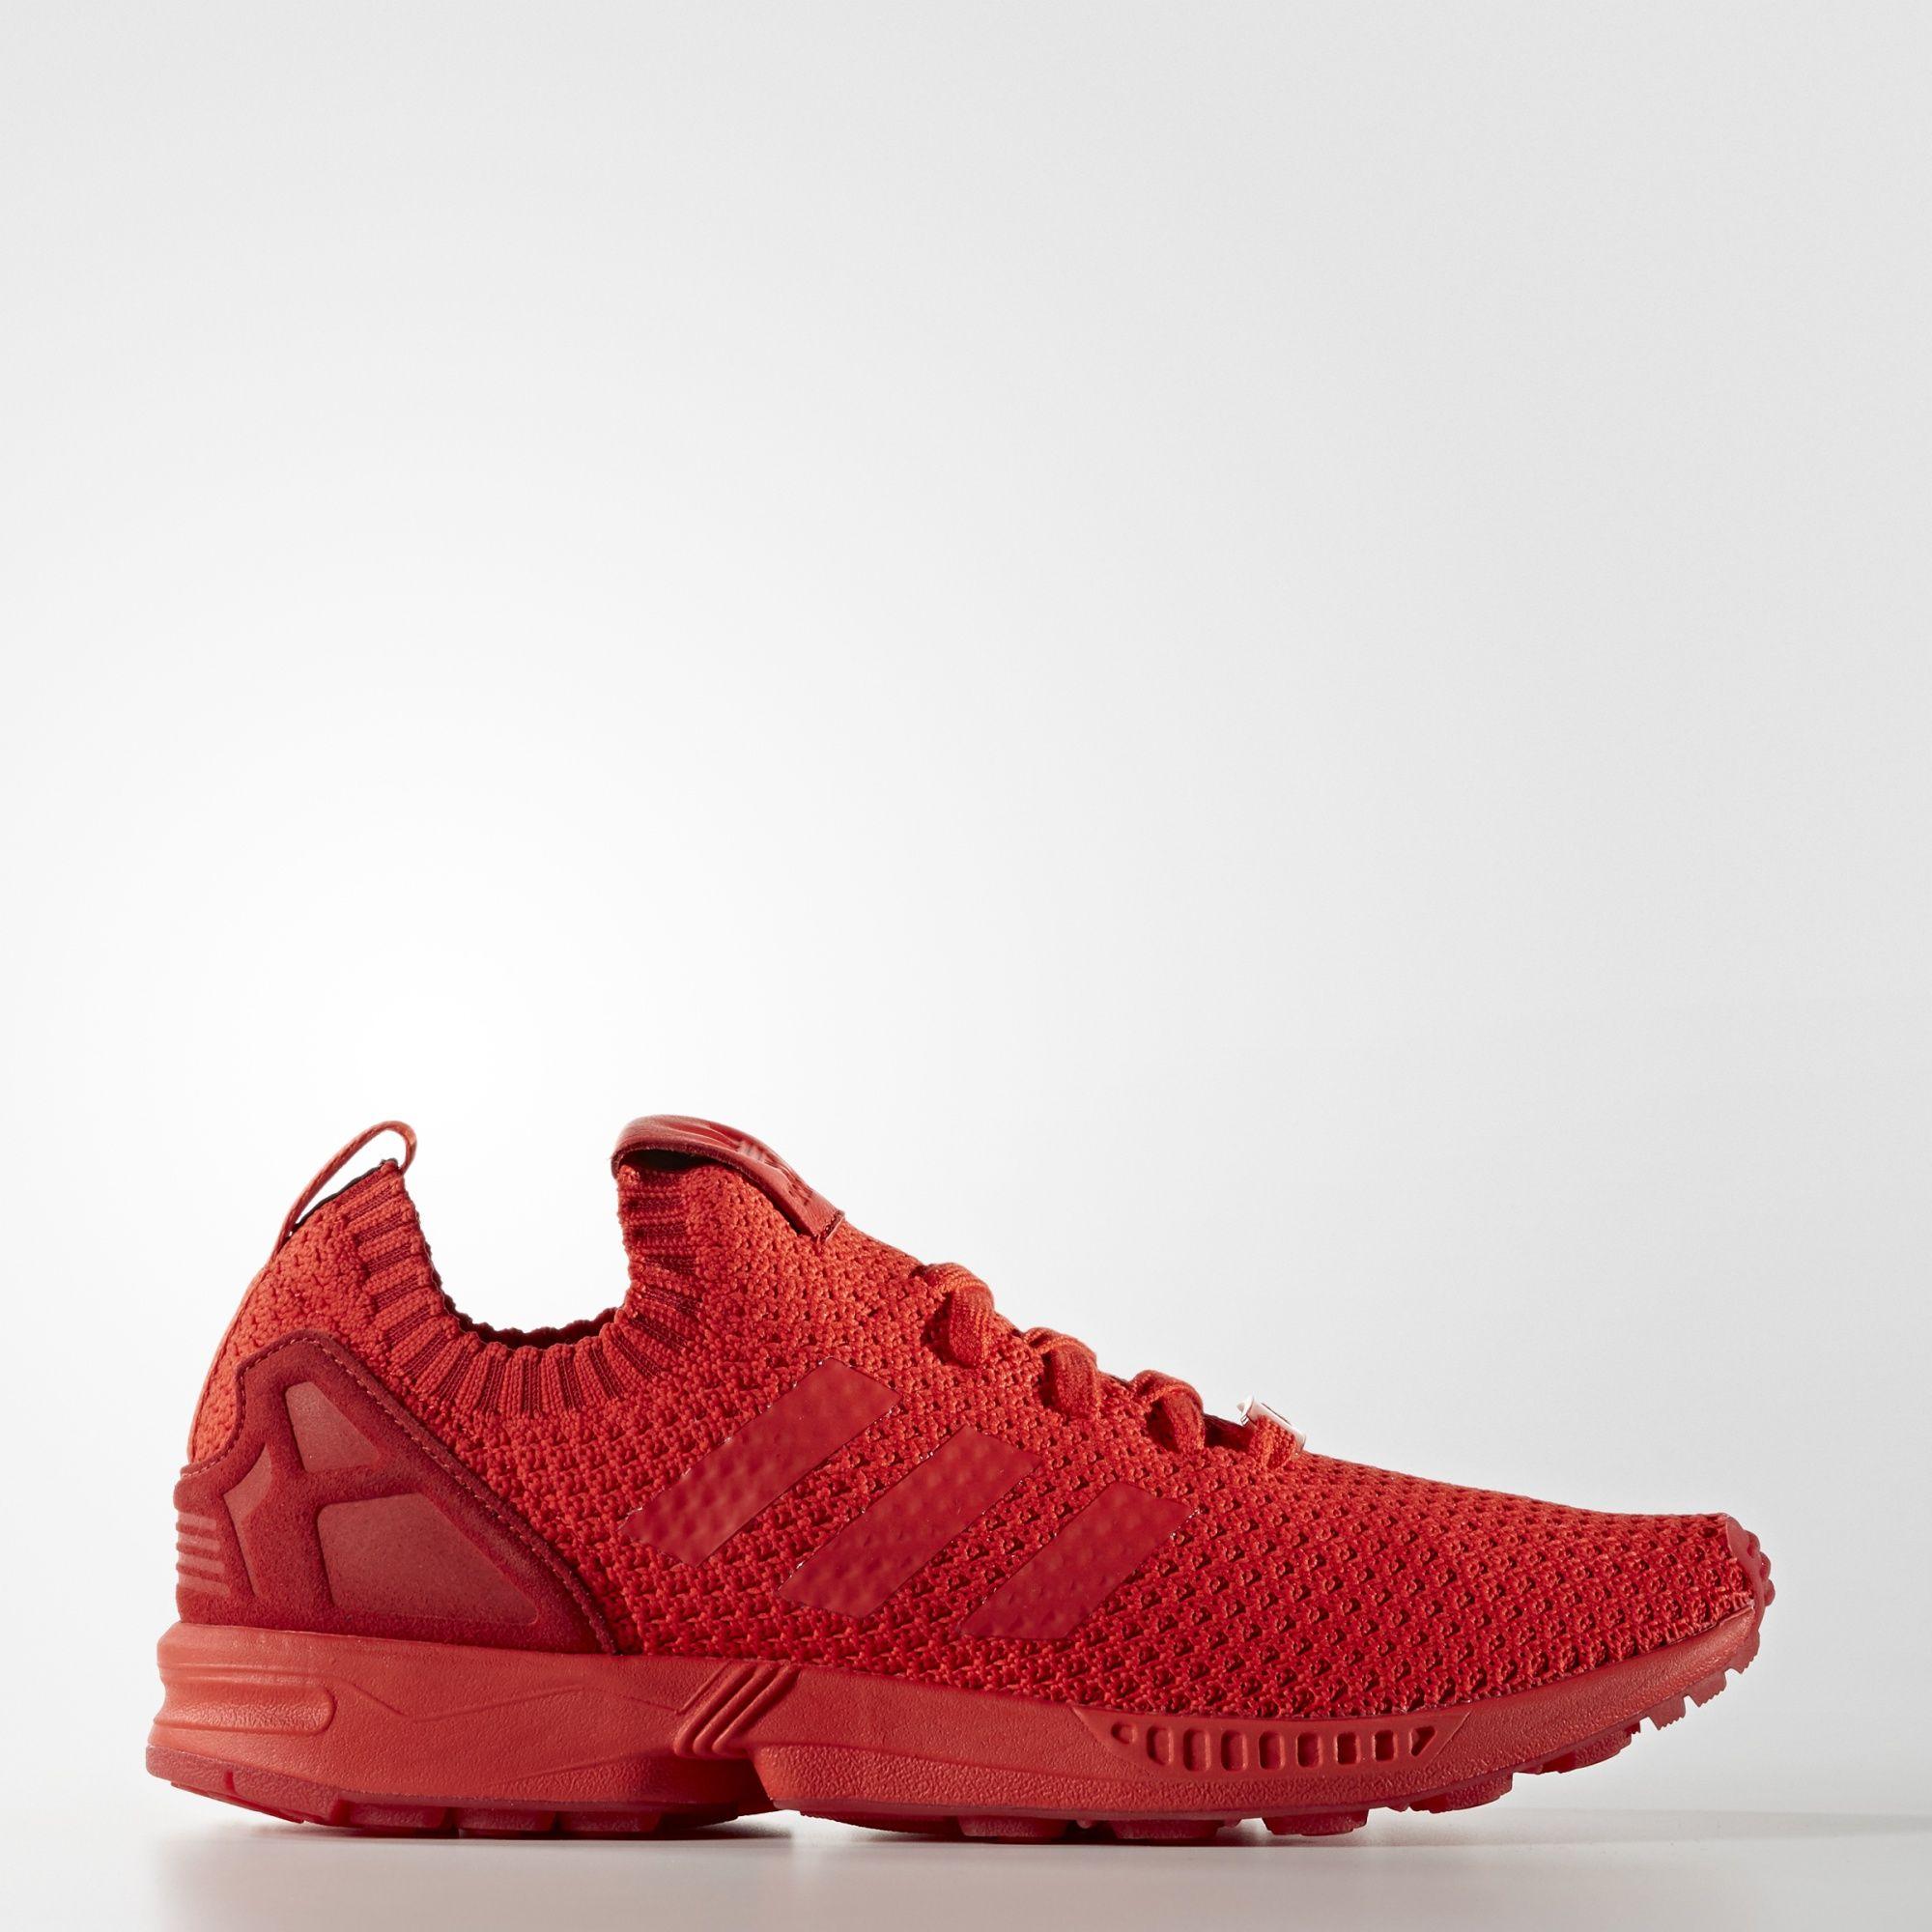 adidas zx flux test